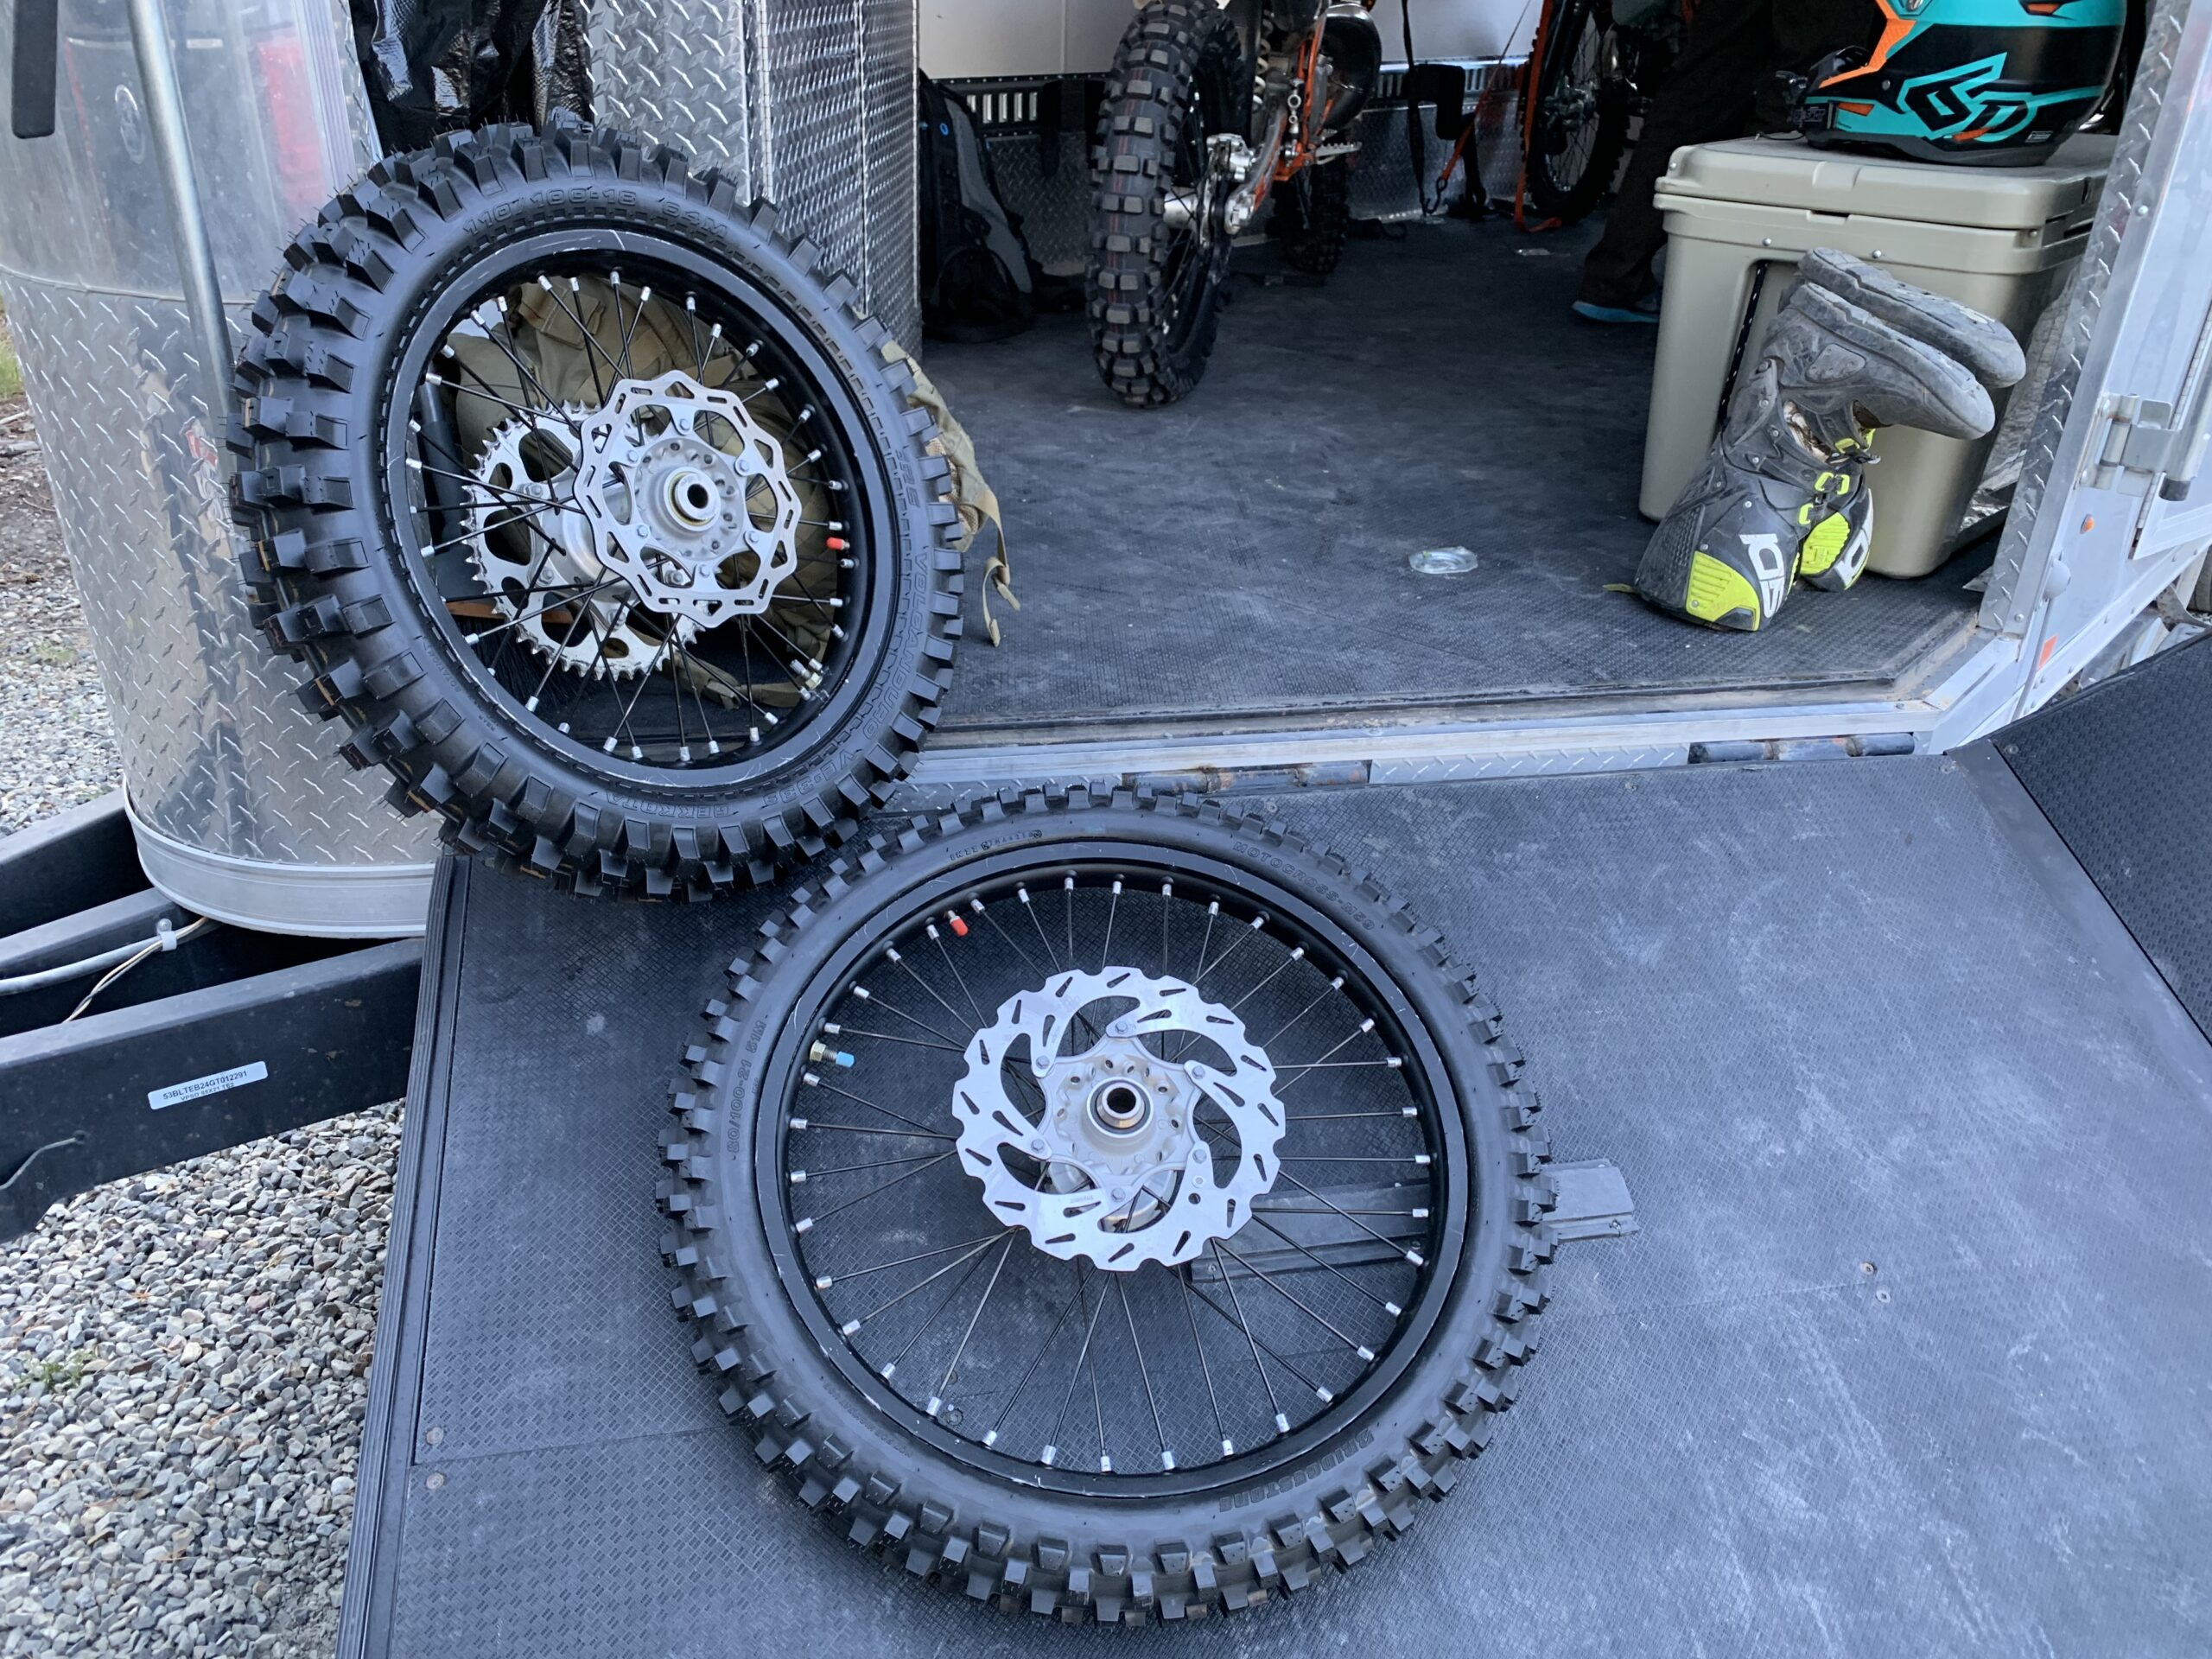 2020 best dirt bike tire guide